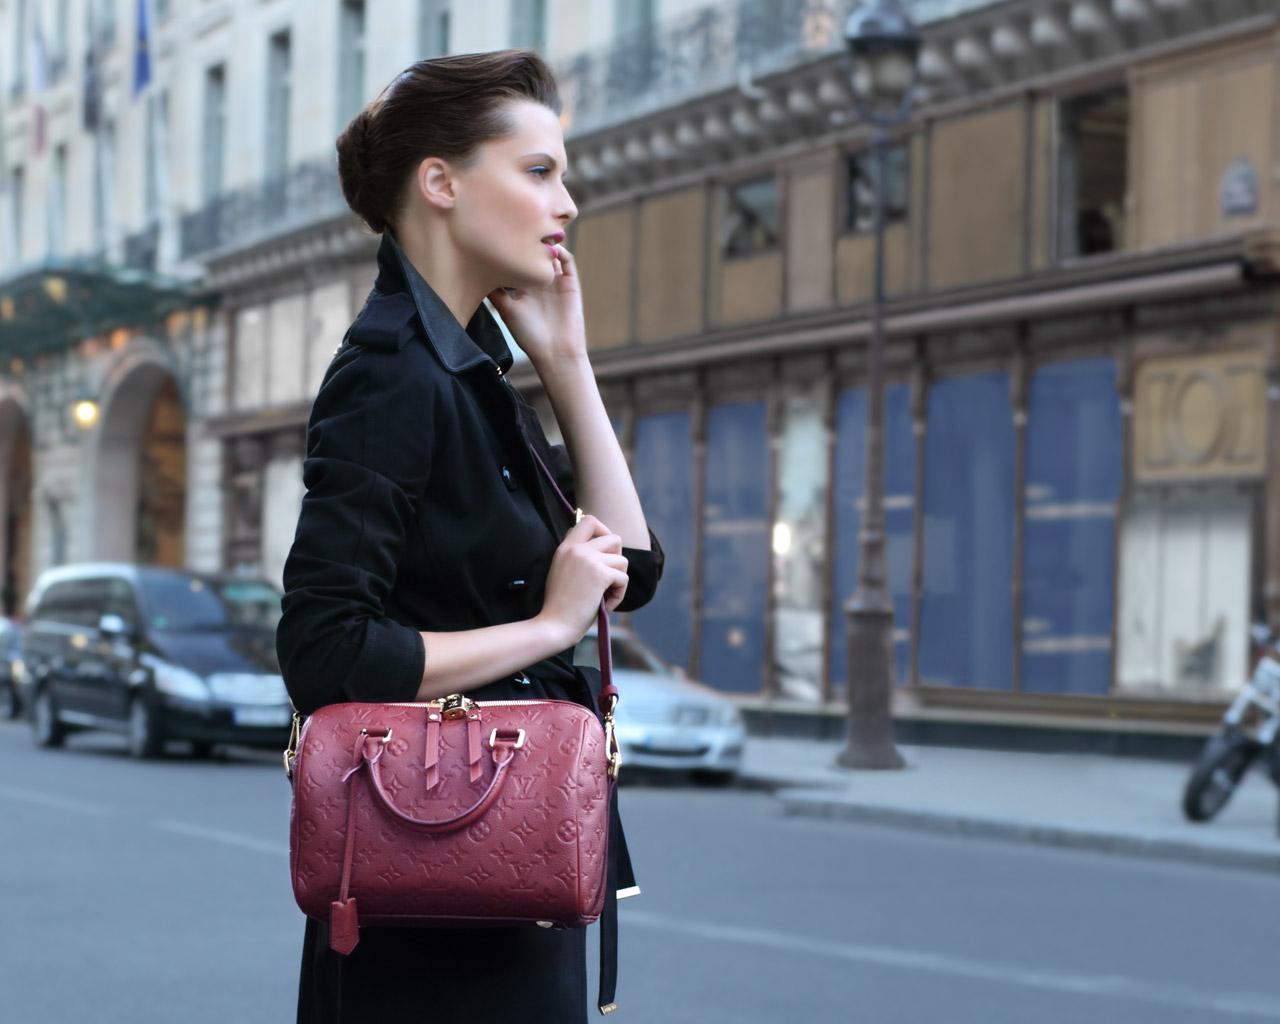 Every Woman Has A Handbag Fashion